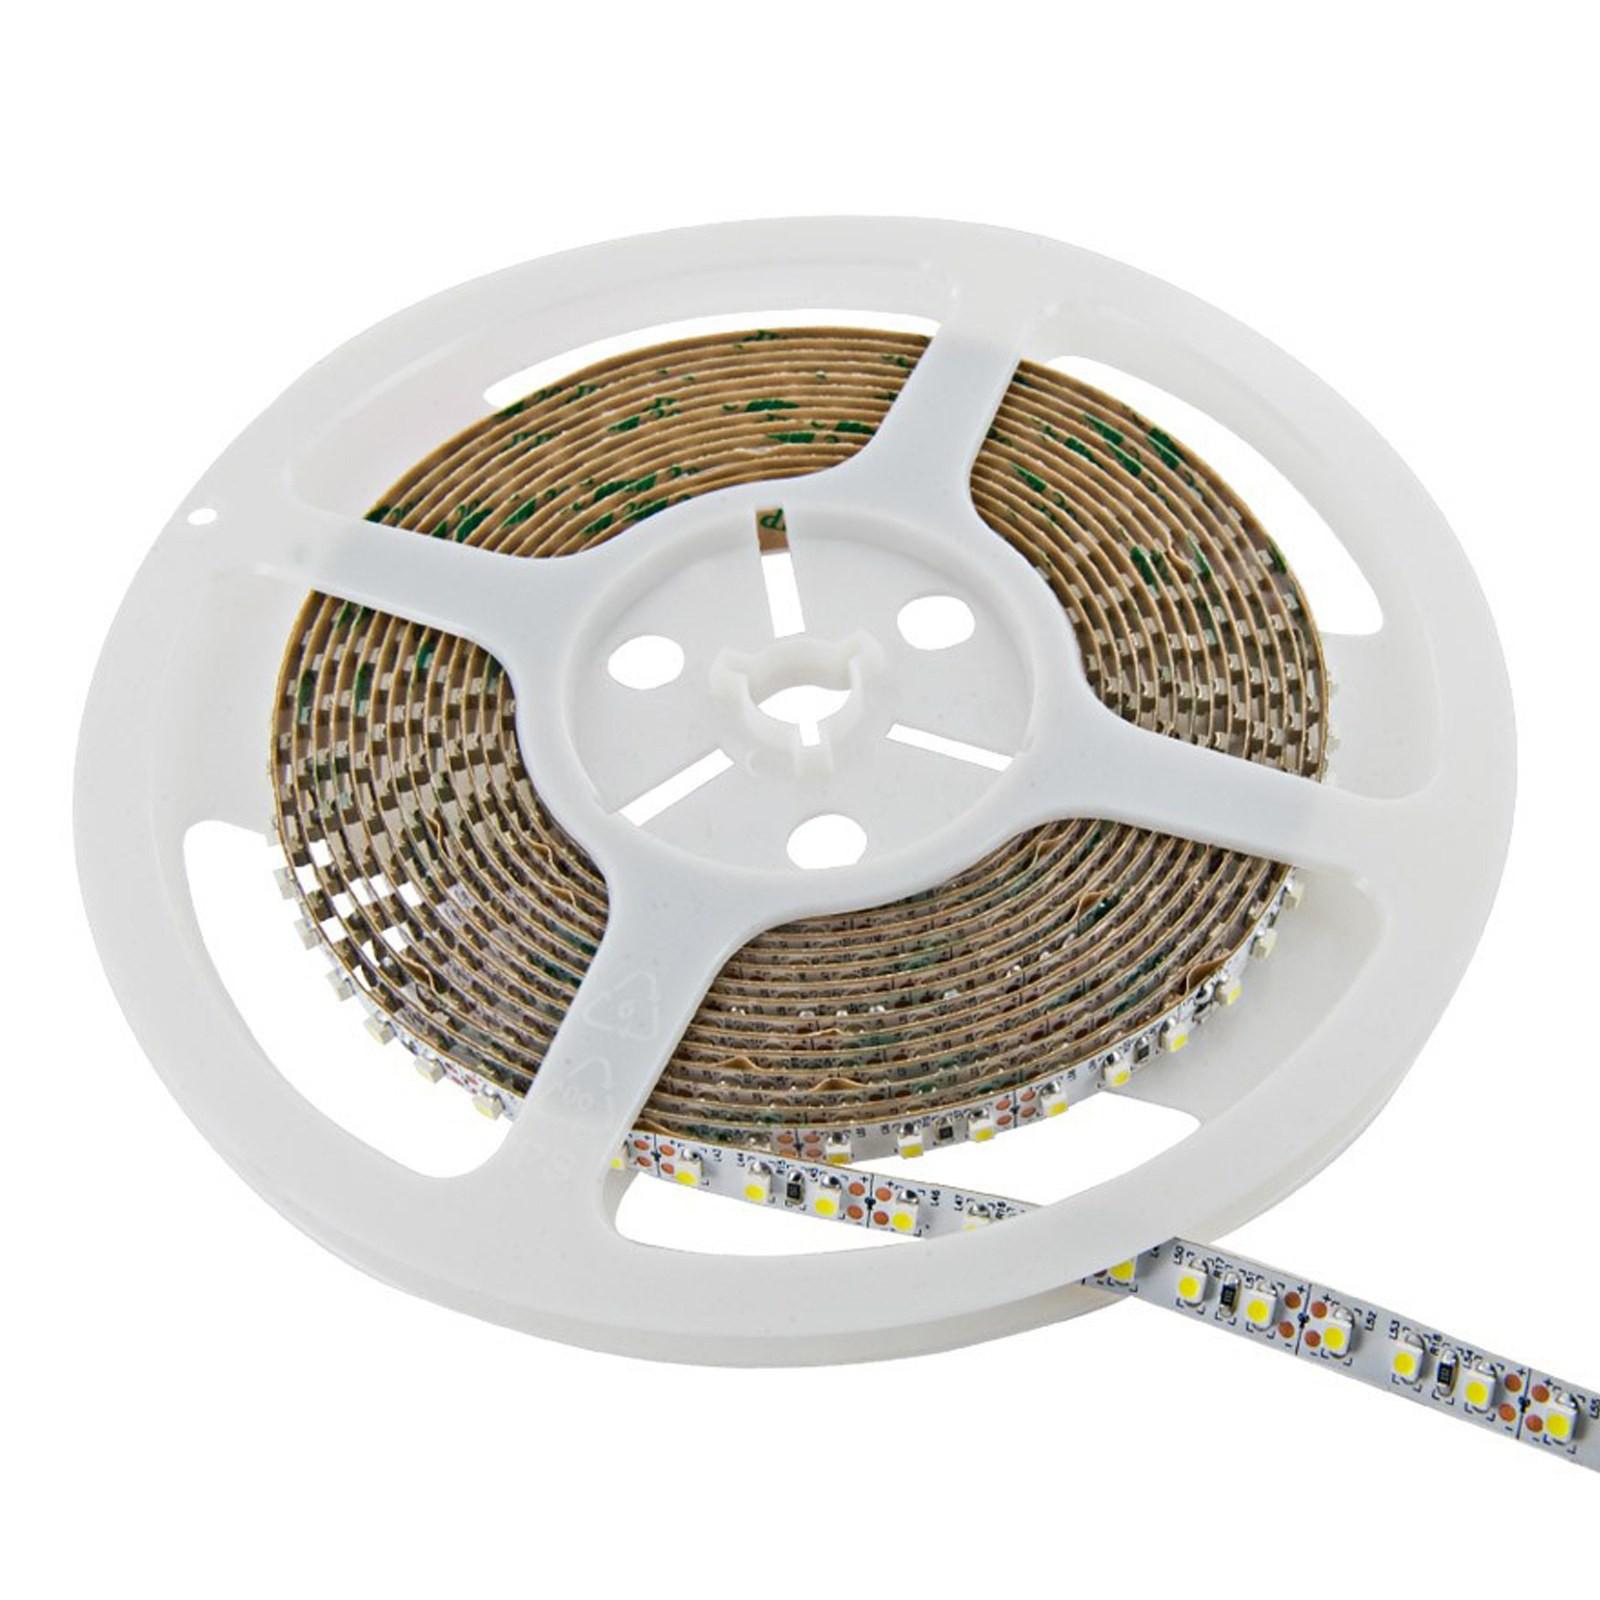 Striscia 600 led strip bobina smd 3528 5 metri v tac luce for Luce bianca led